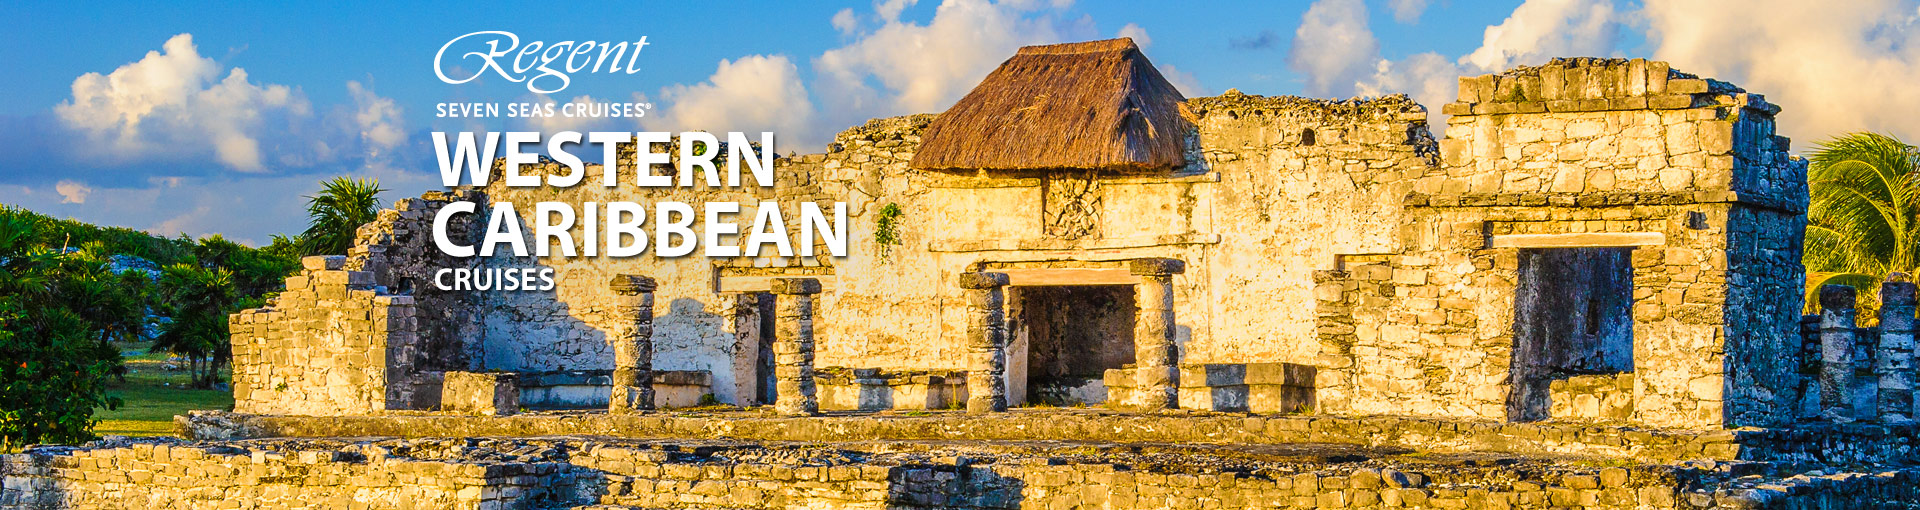 Regent Seven Seas Cruises Western Caribbean Cruise